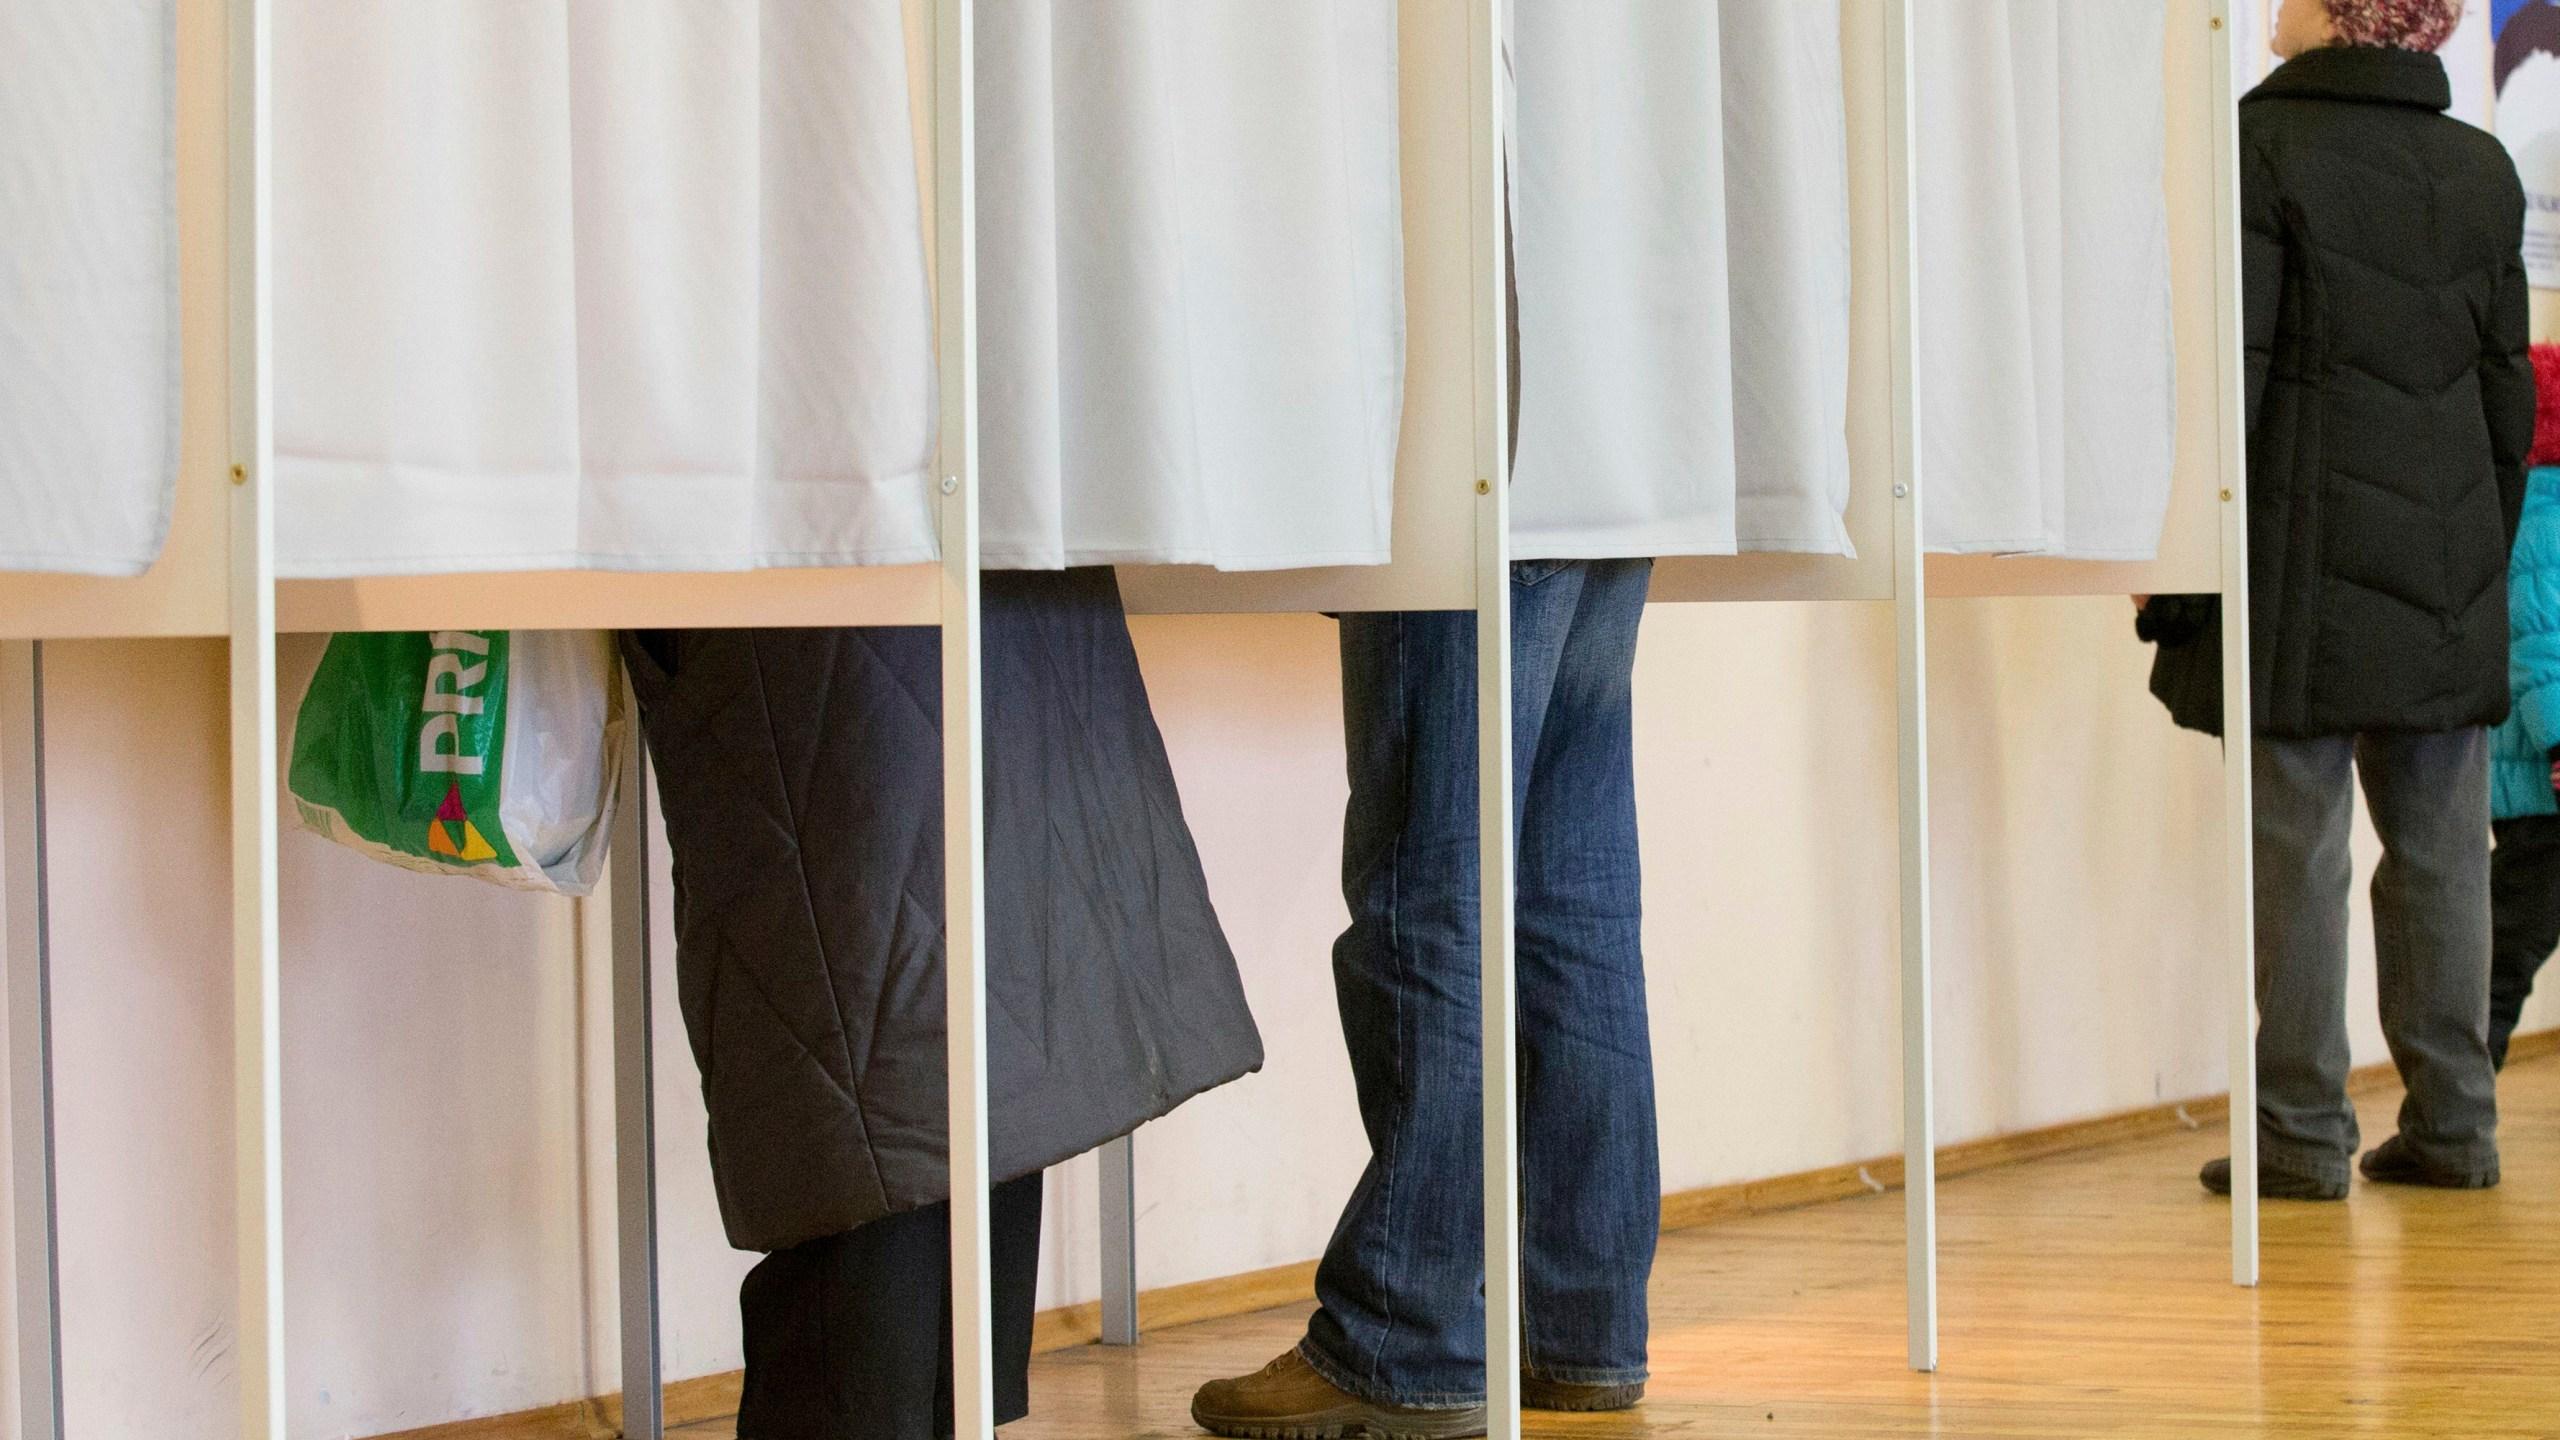 Estonia_Online_Voting_03856-159532.jpg44811334